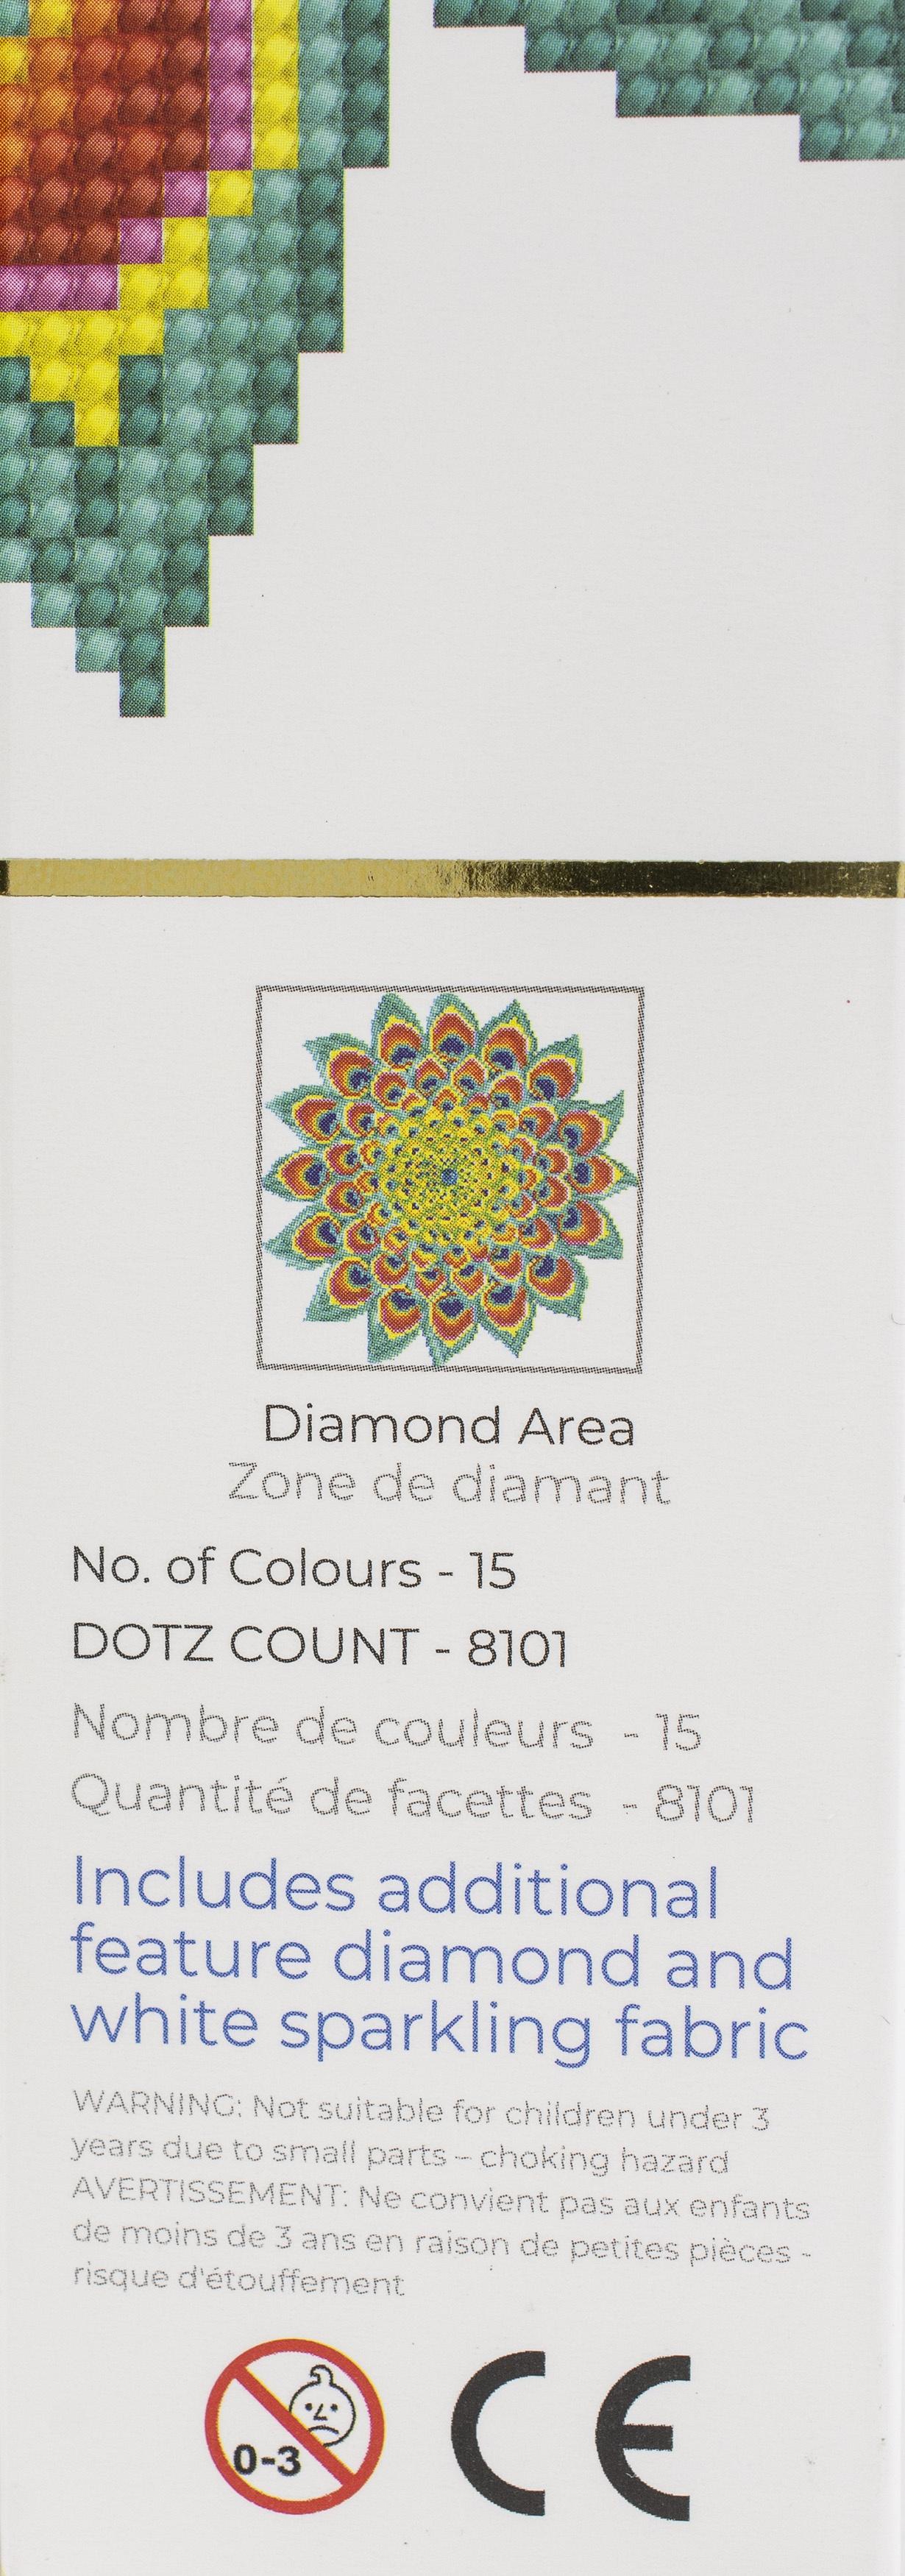 Diamond Dotz Diamond Embroidery Facet Art Kit 12.6X12.6-Peacock Mandala